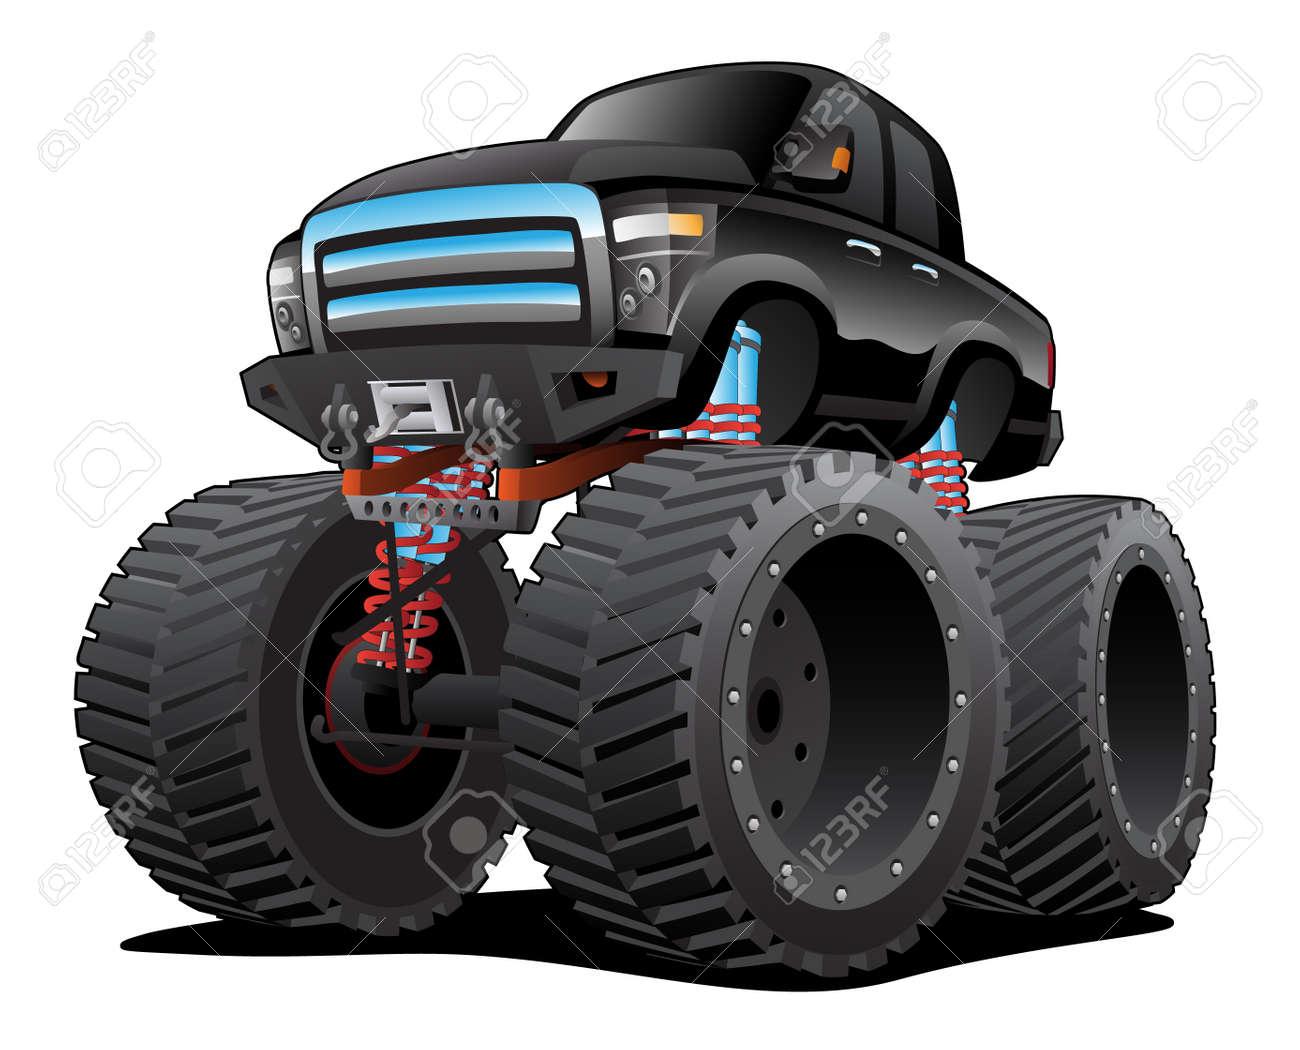 Monster Pickup Truck Cartoon Isolated Vector Illustration - 133200017